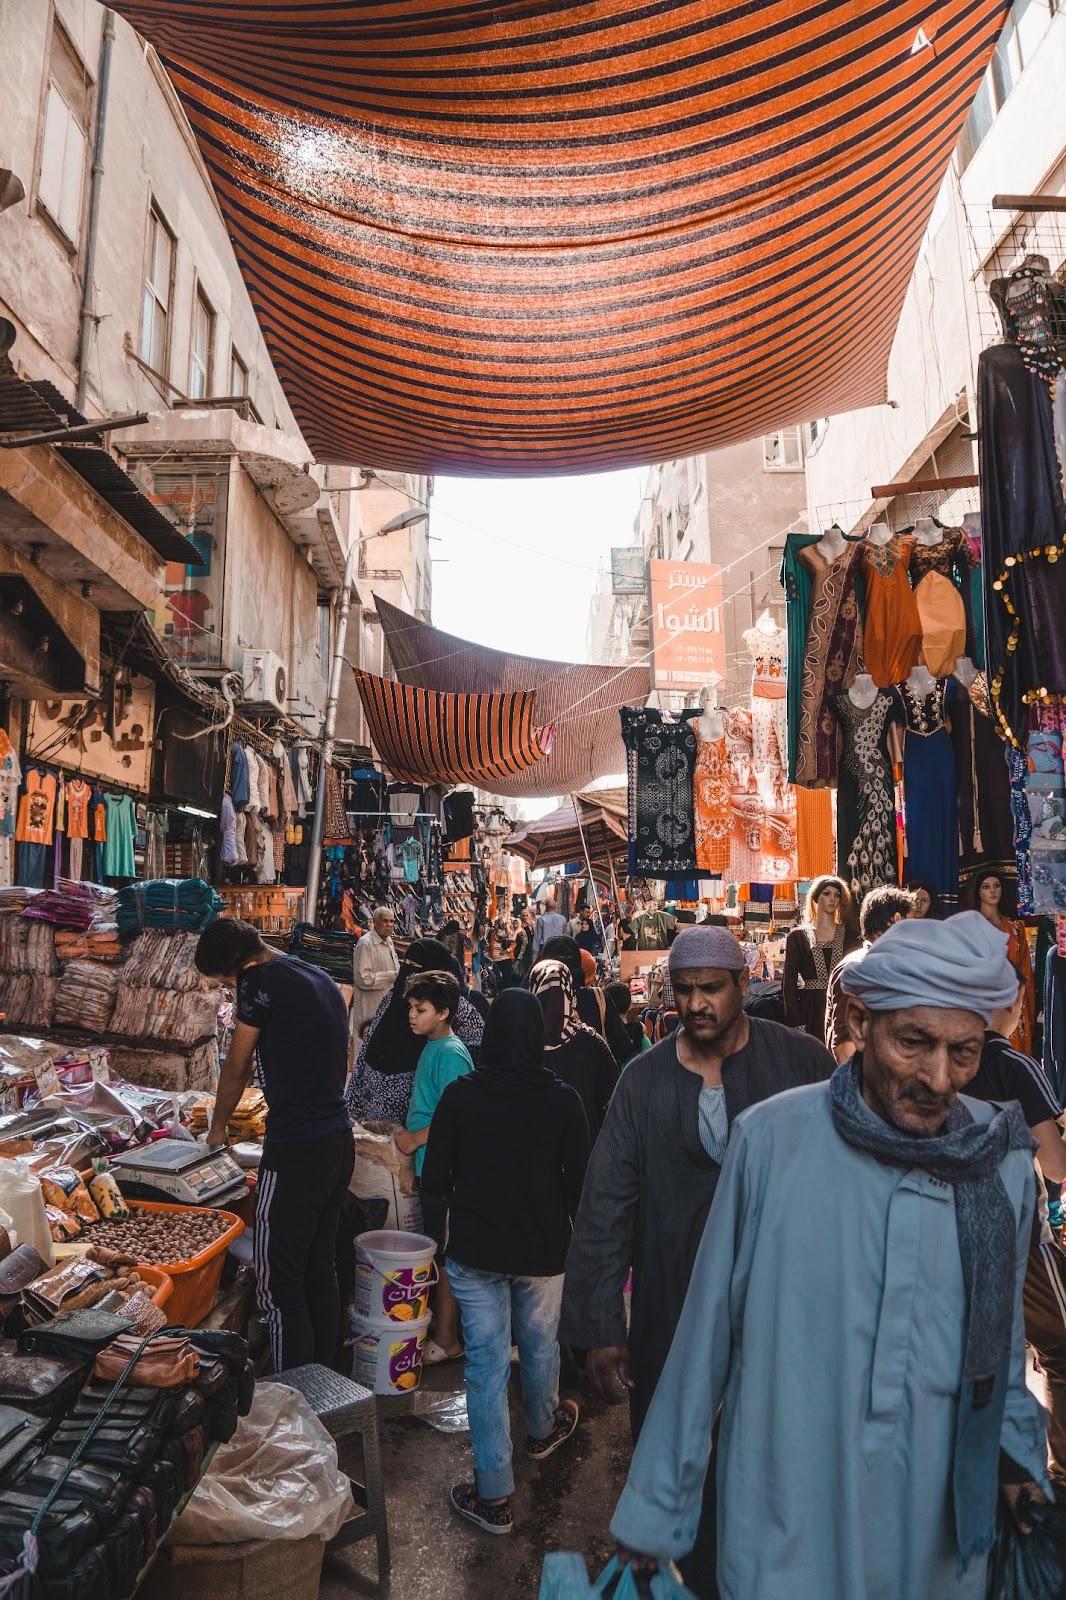 C:\Users\Shrutika Yadav\Downloads\shopping-market-in-cairo.jpg